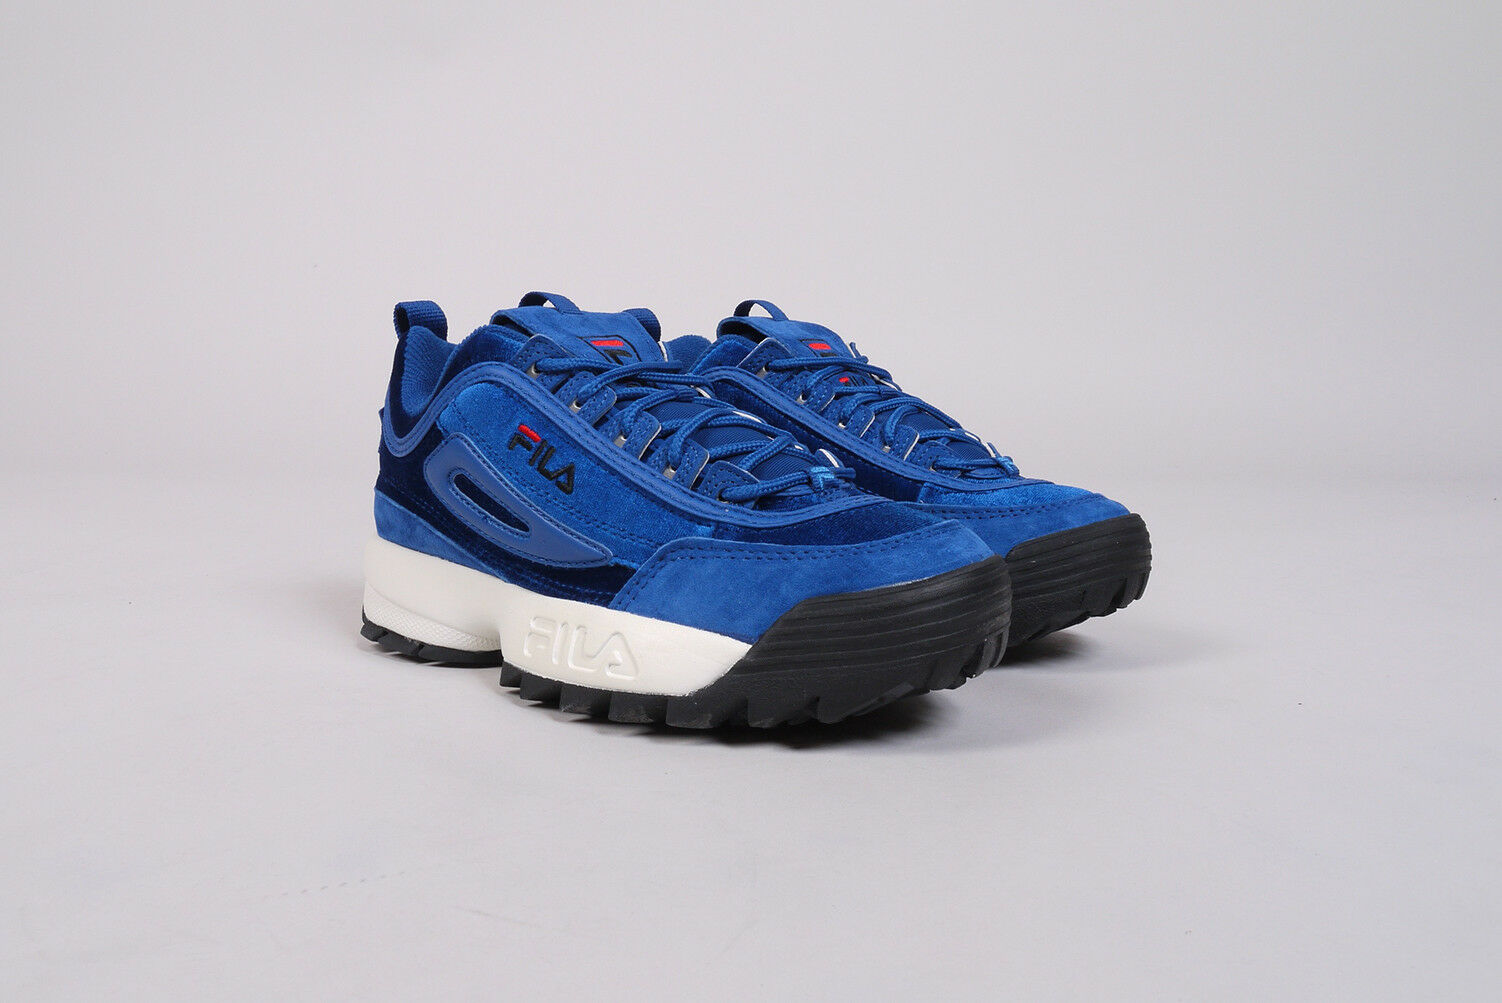 FILA Disruper Low Velvet Wmns EU  36 scarpe da ginnastica donna scarpe Platform donna  acquista marca